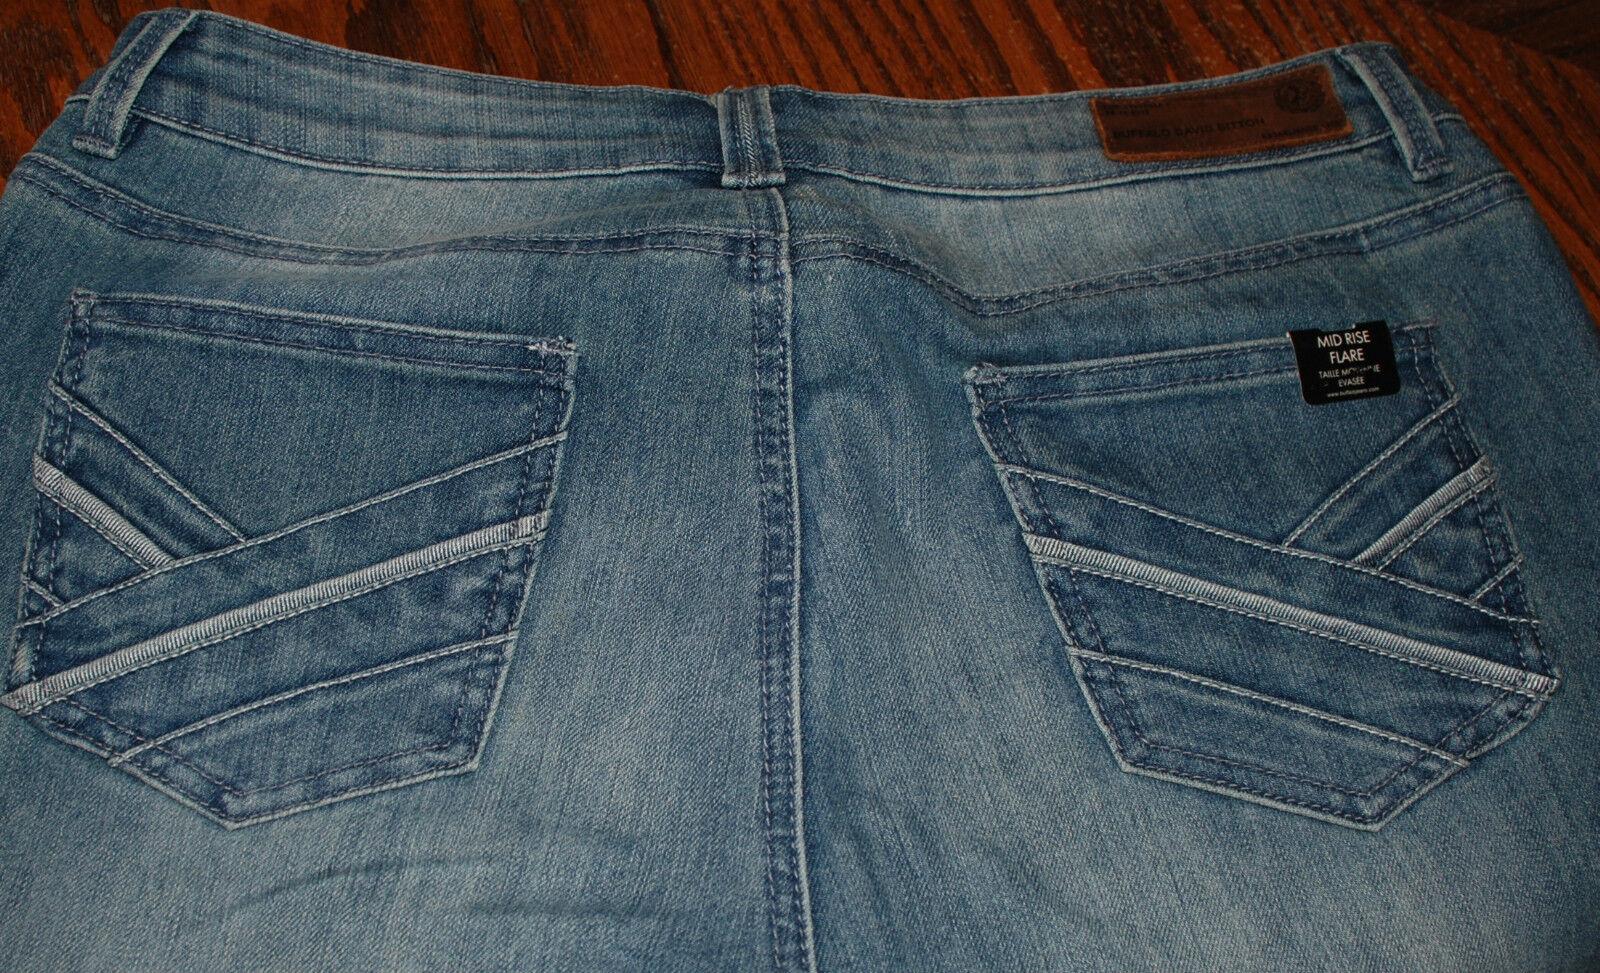 Size 32 x 33 NWT  Buffalo David Bitton Gallia Flare Jeans